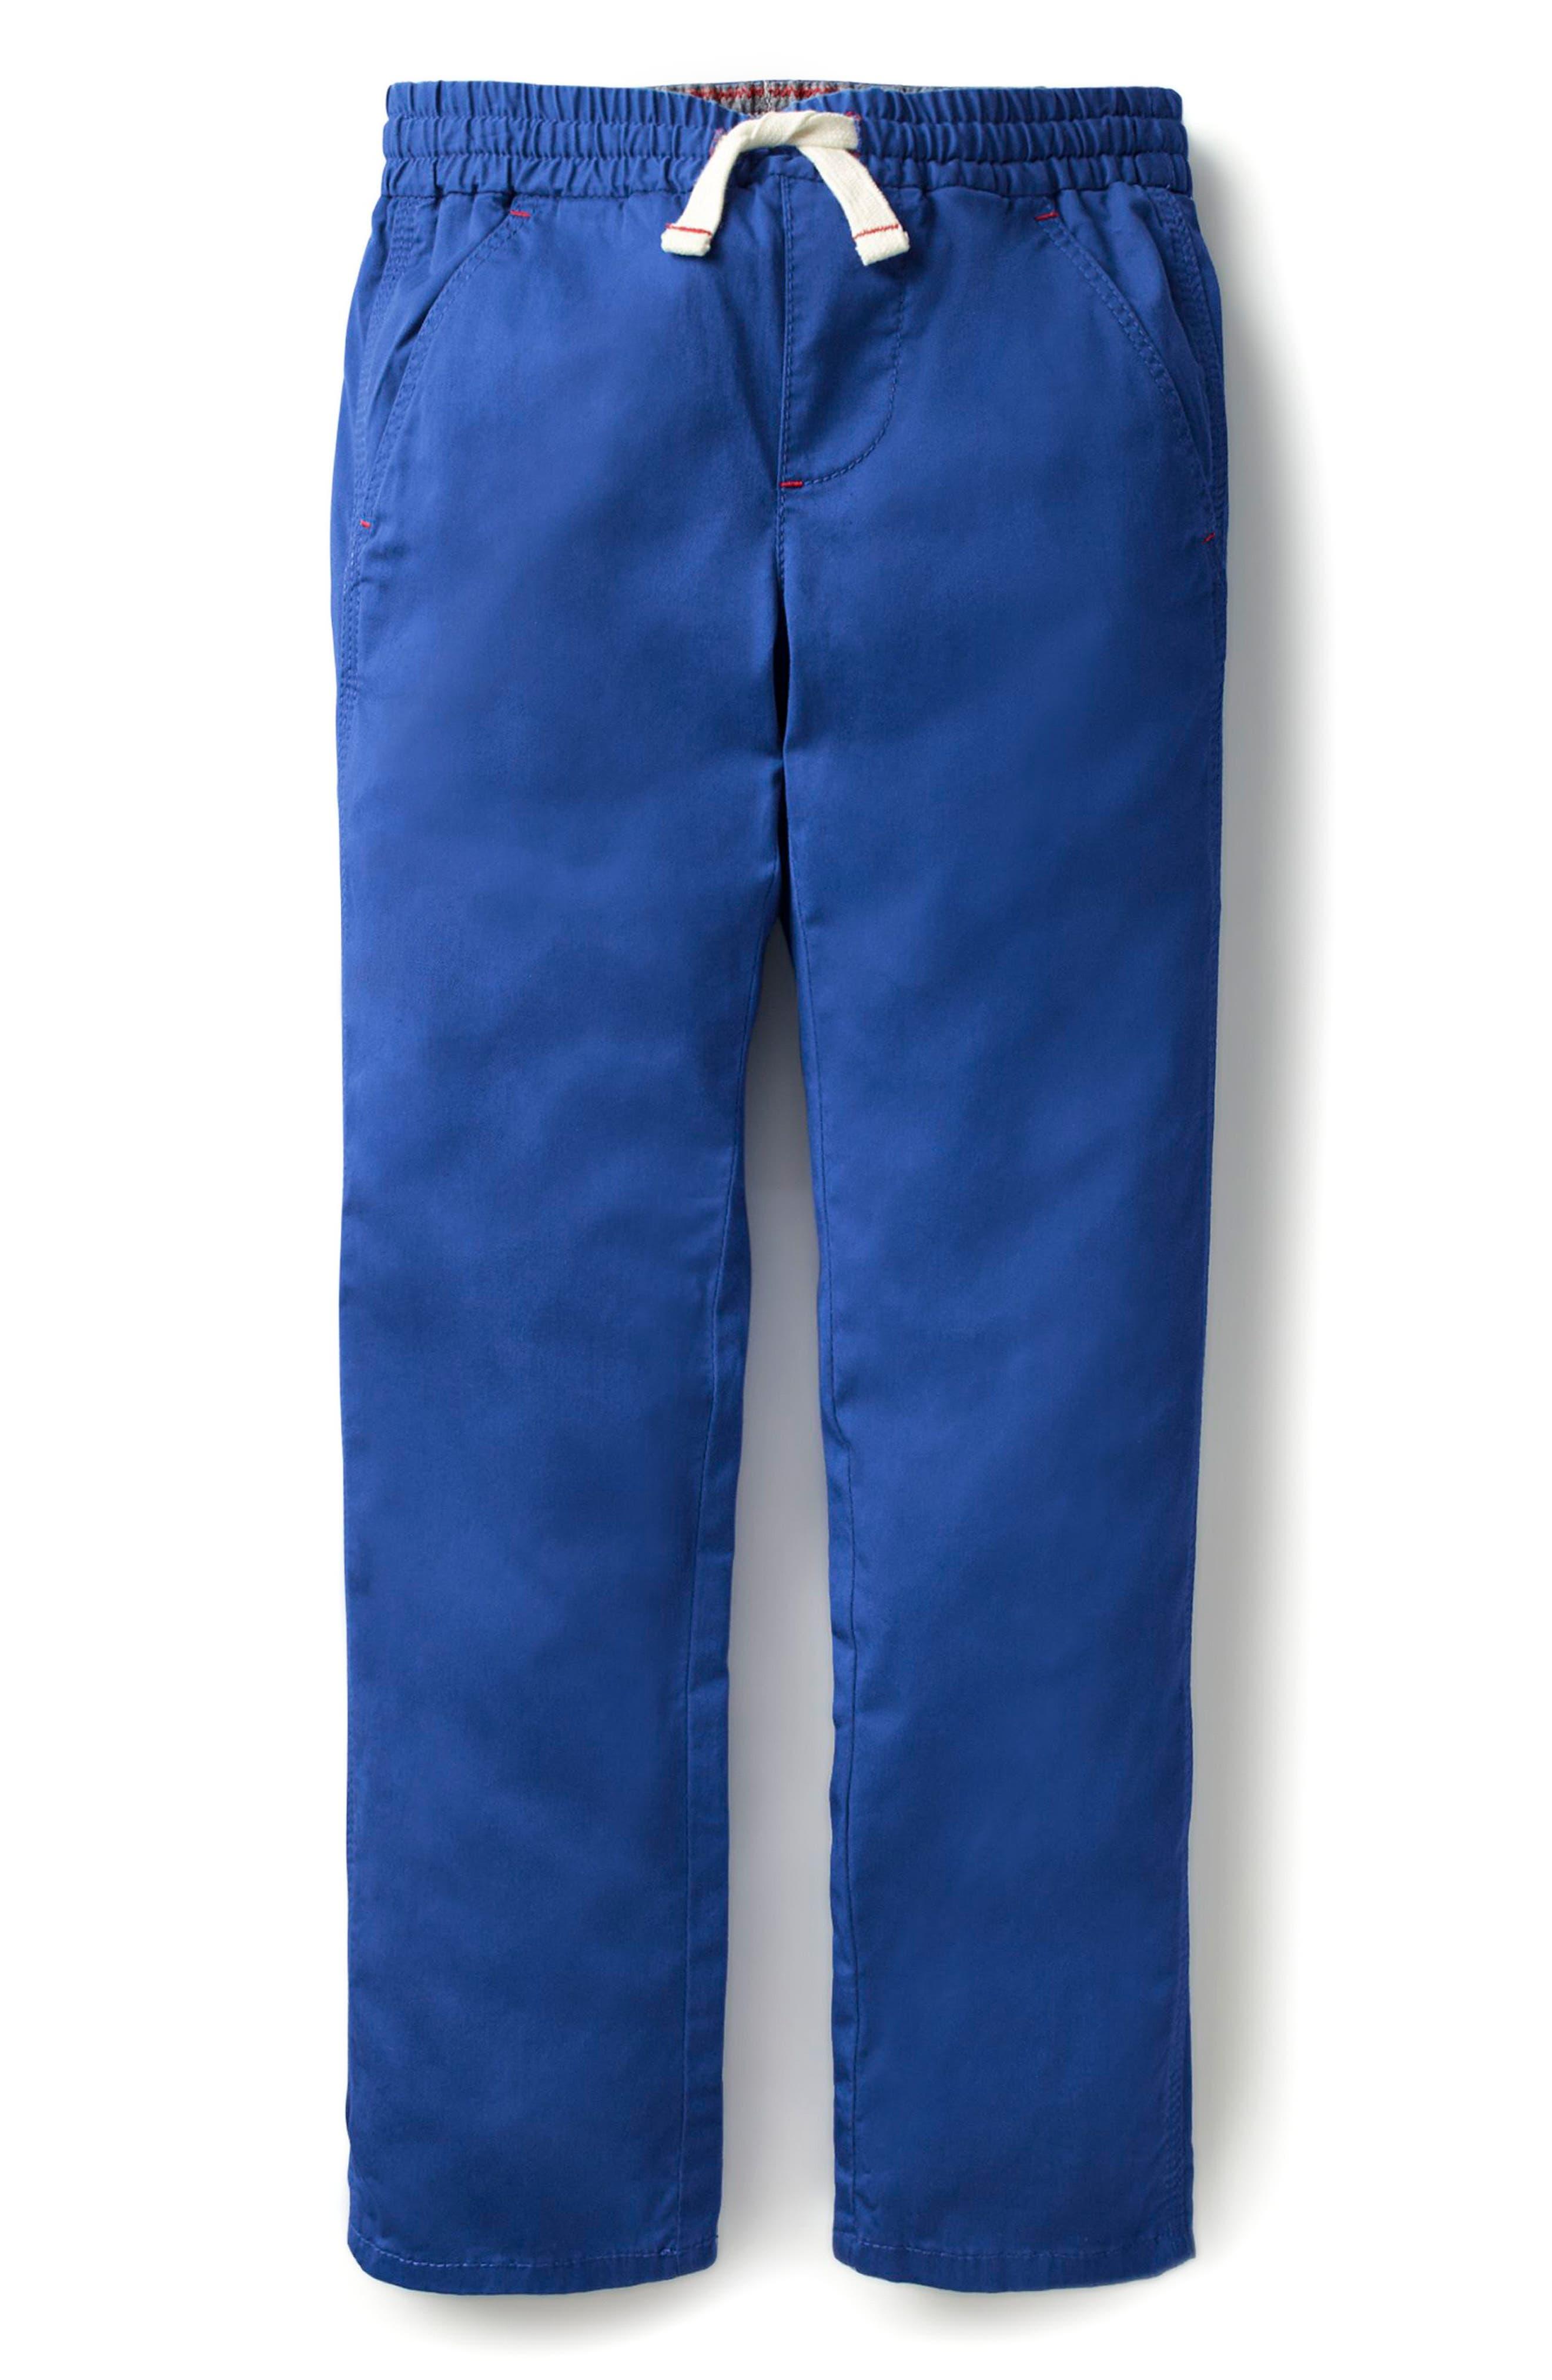 Chino Pants,                             Main thumbnail 1, color,                             Orion Blue